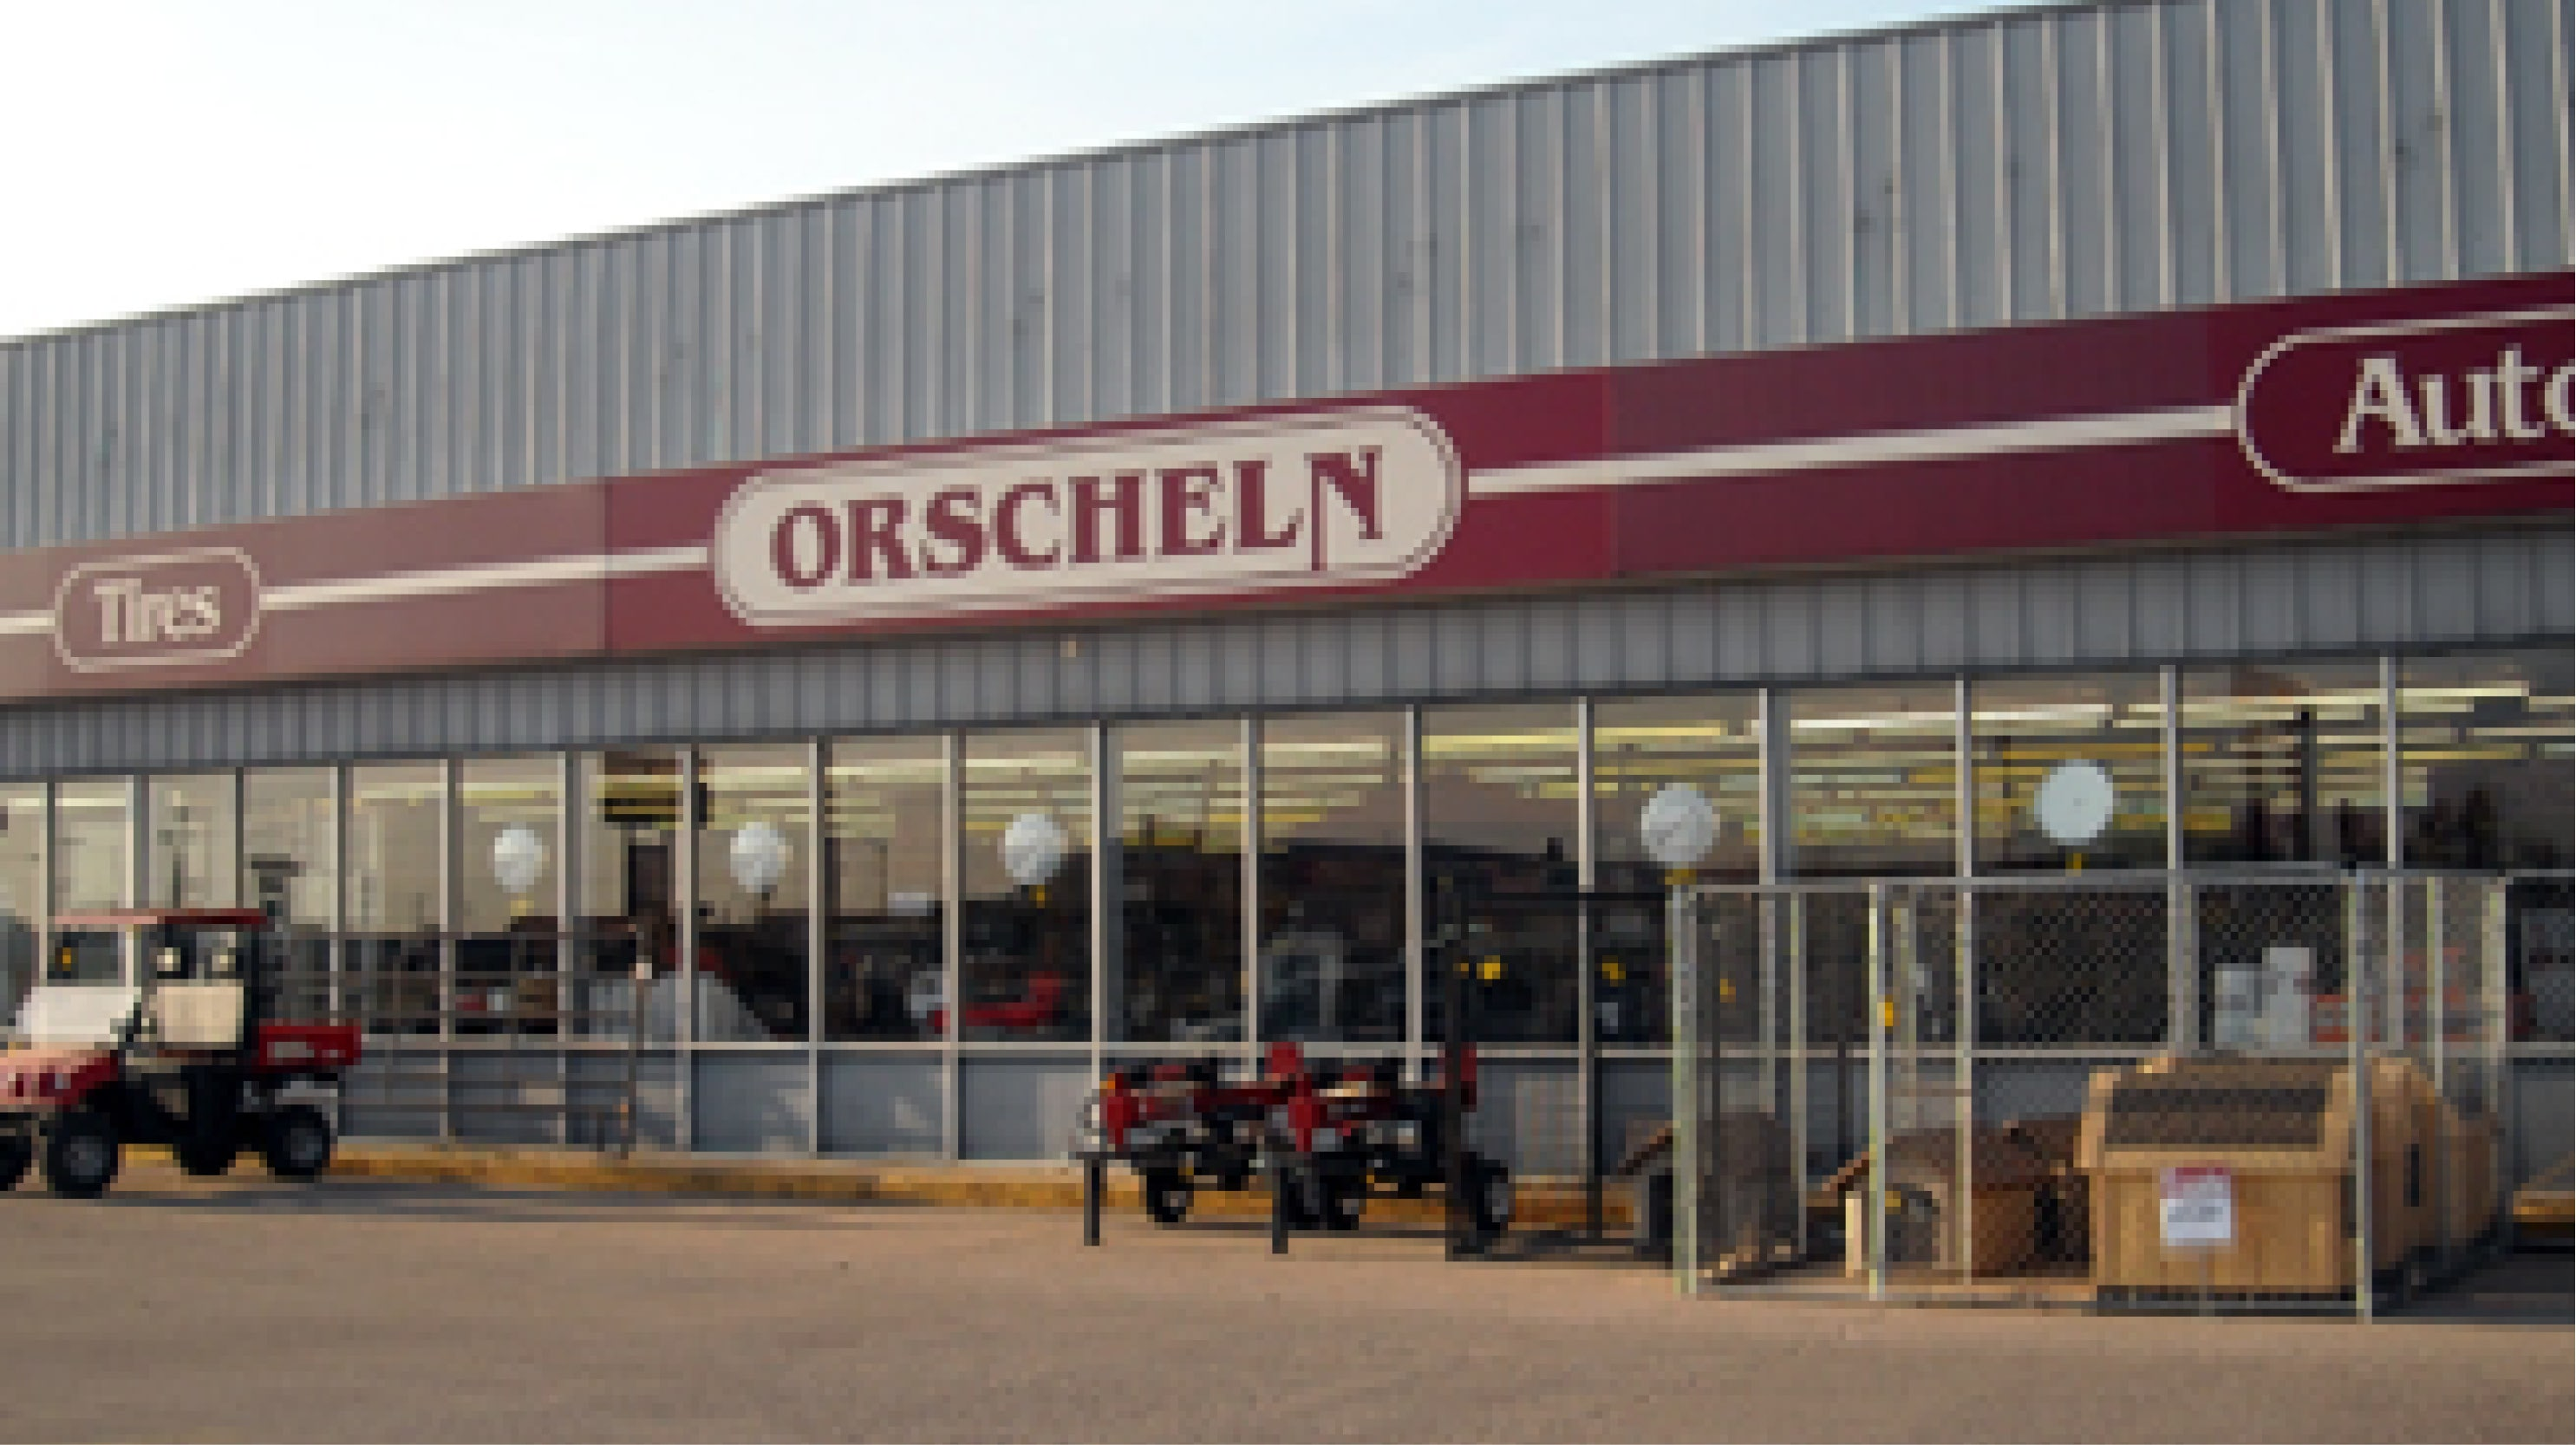 Front view of Orscheln Farm & Home Store in Pratt, Kansas 67124-2071